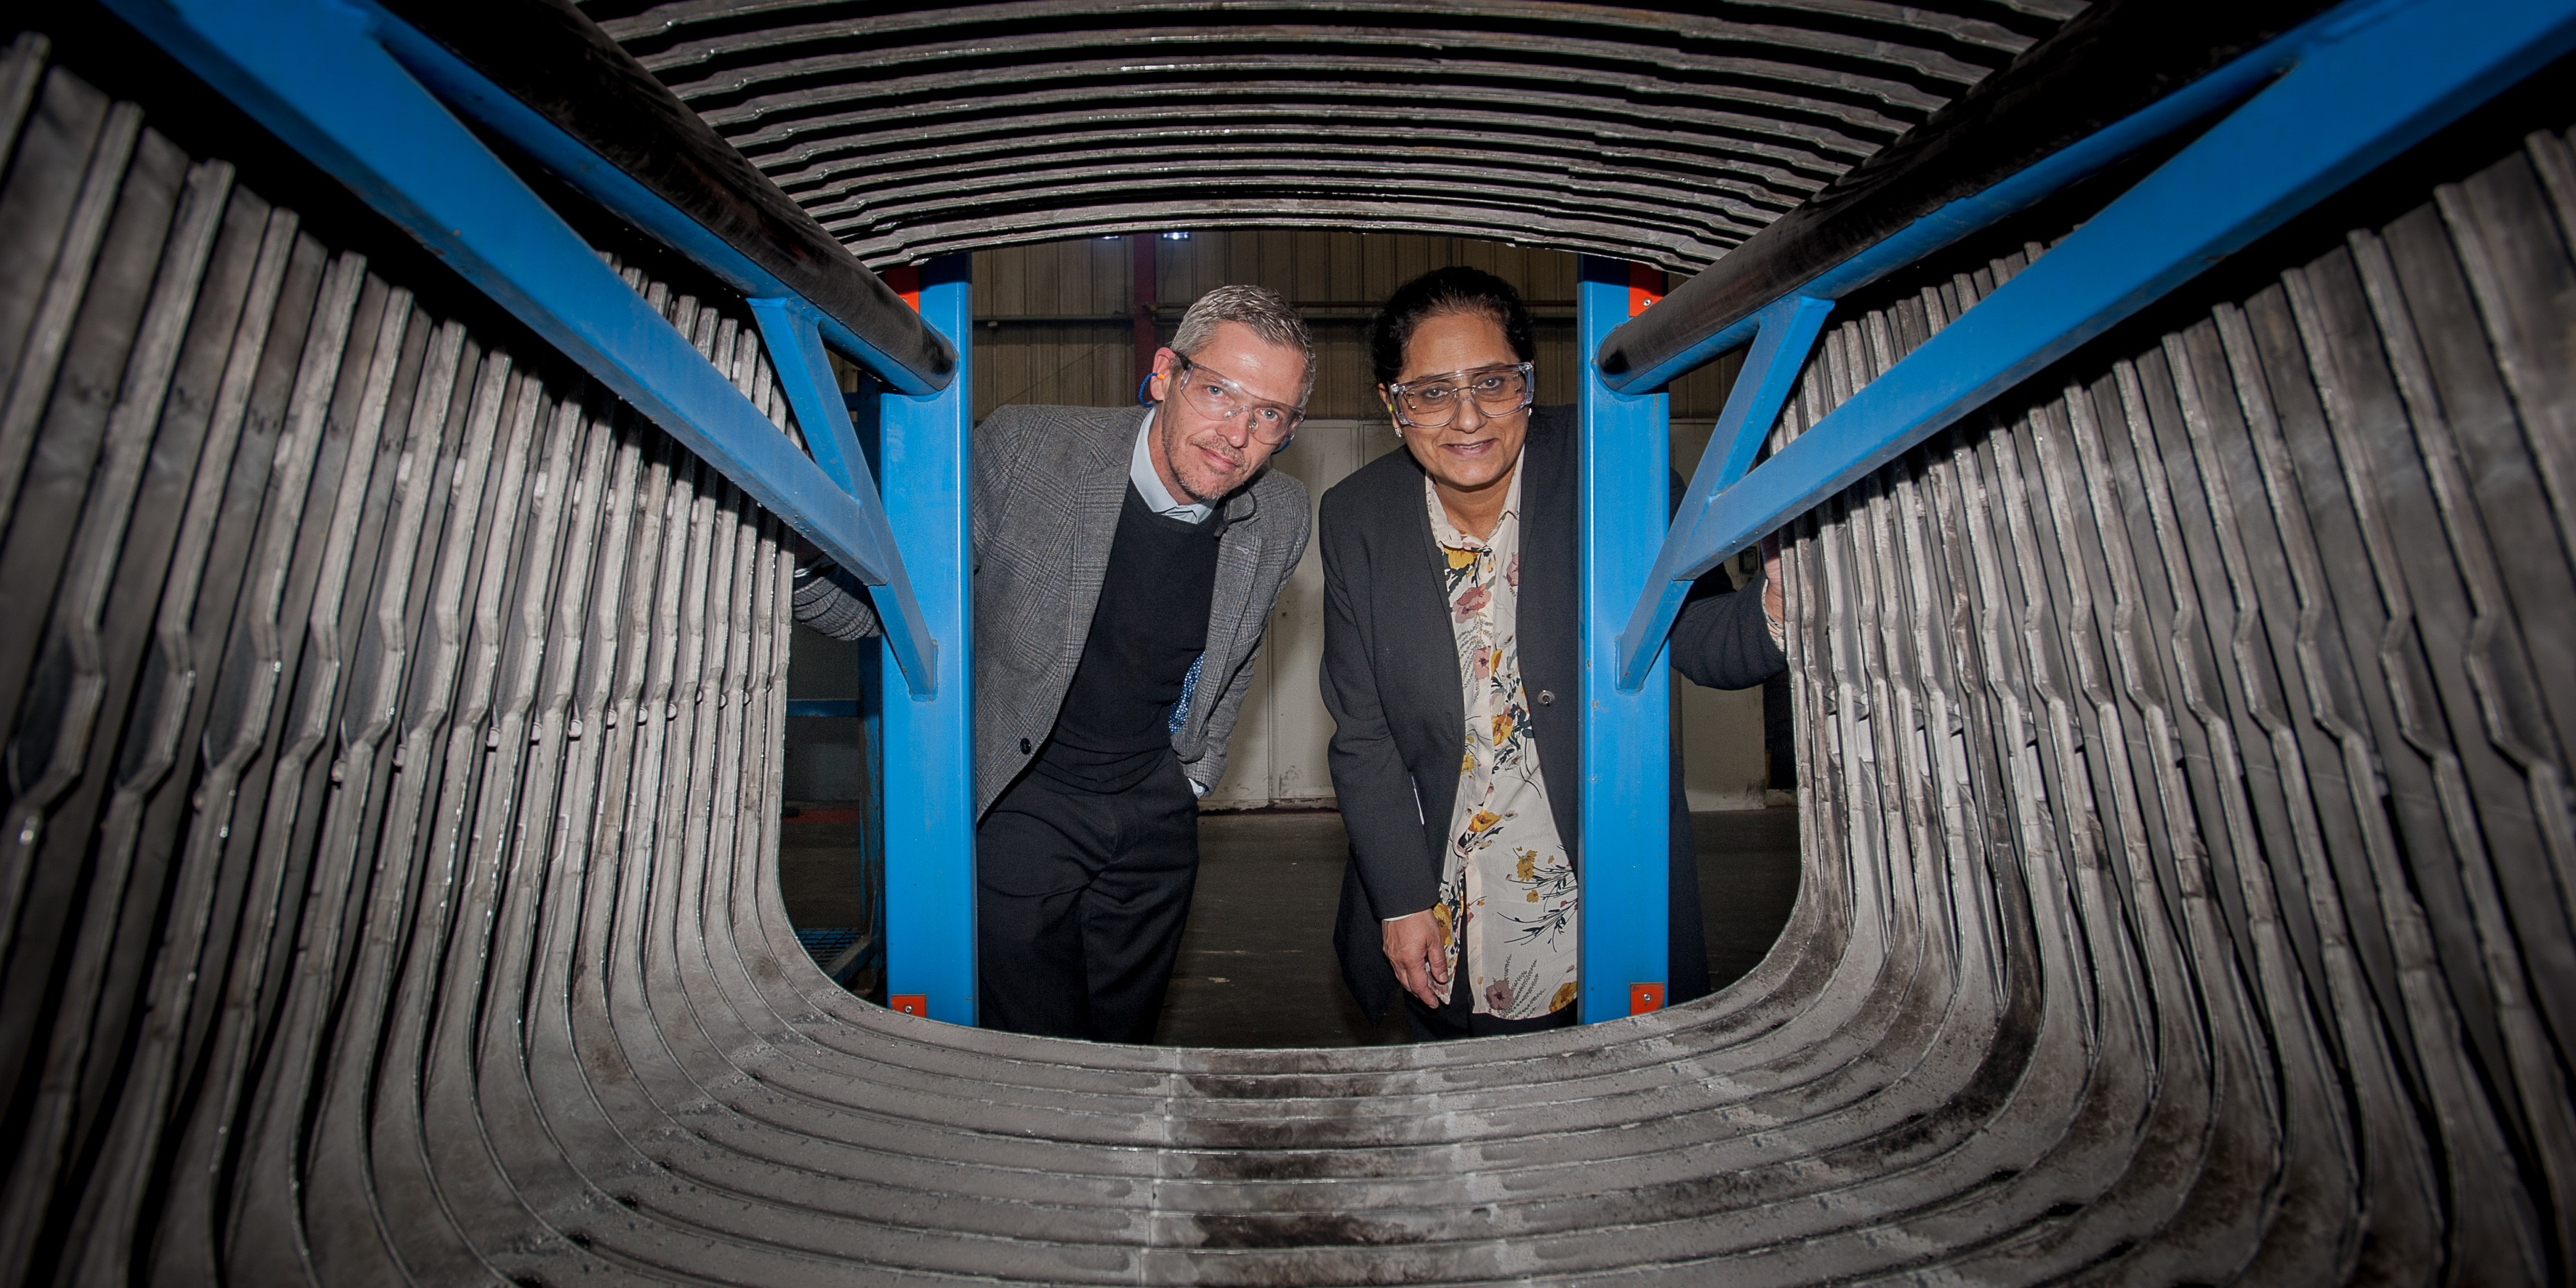 Professor Hanifa Shah of Birmingham City University with Randy Chalmers of Meridian